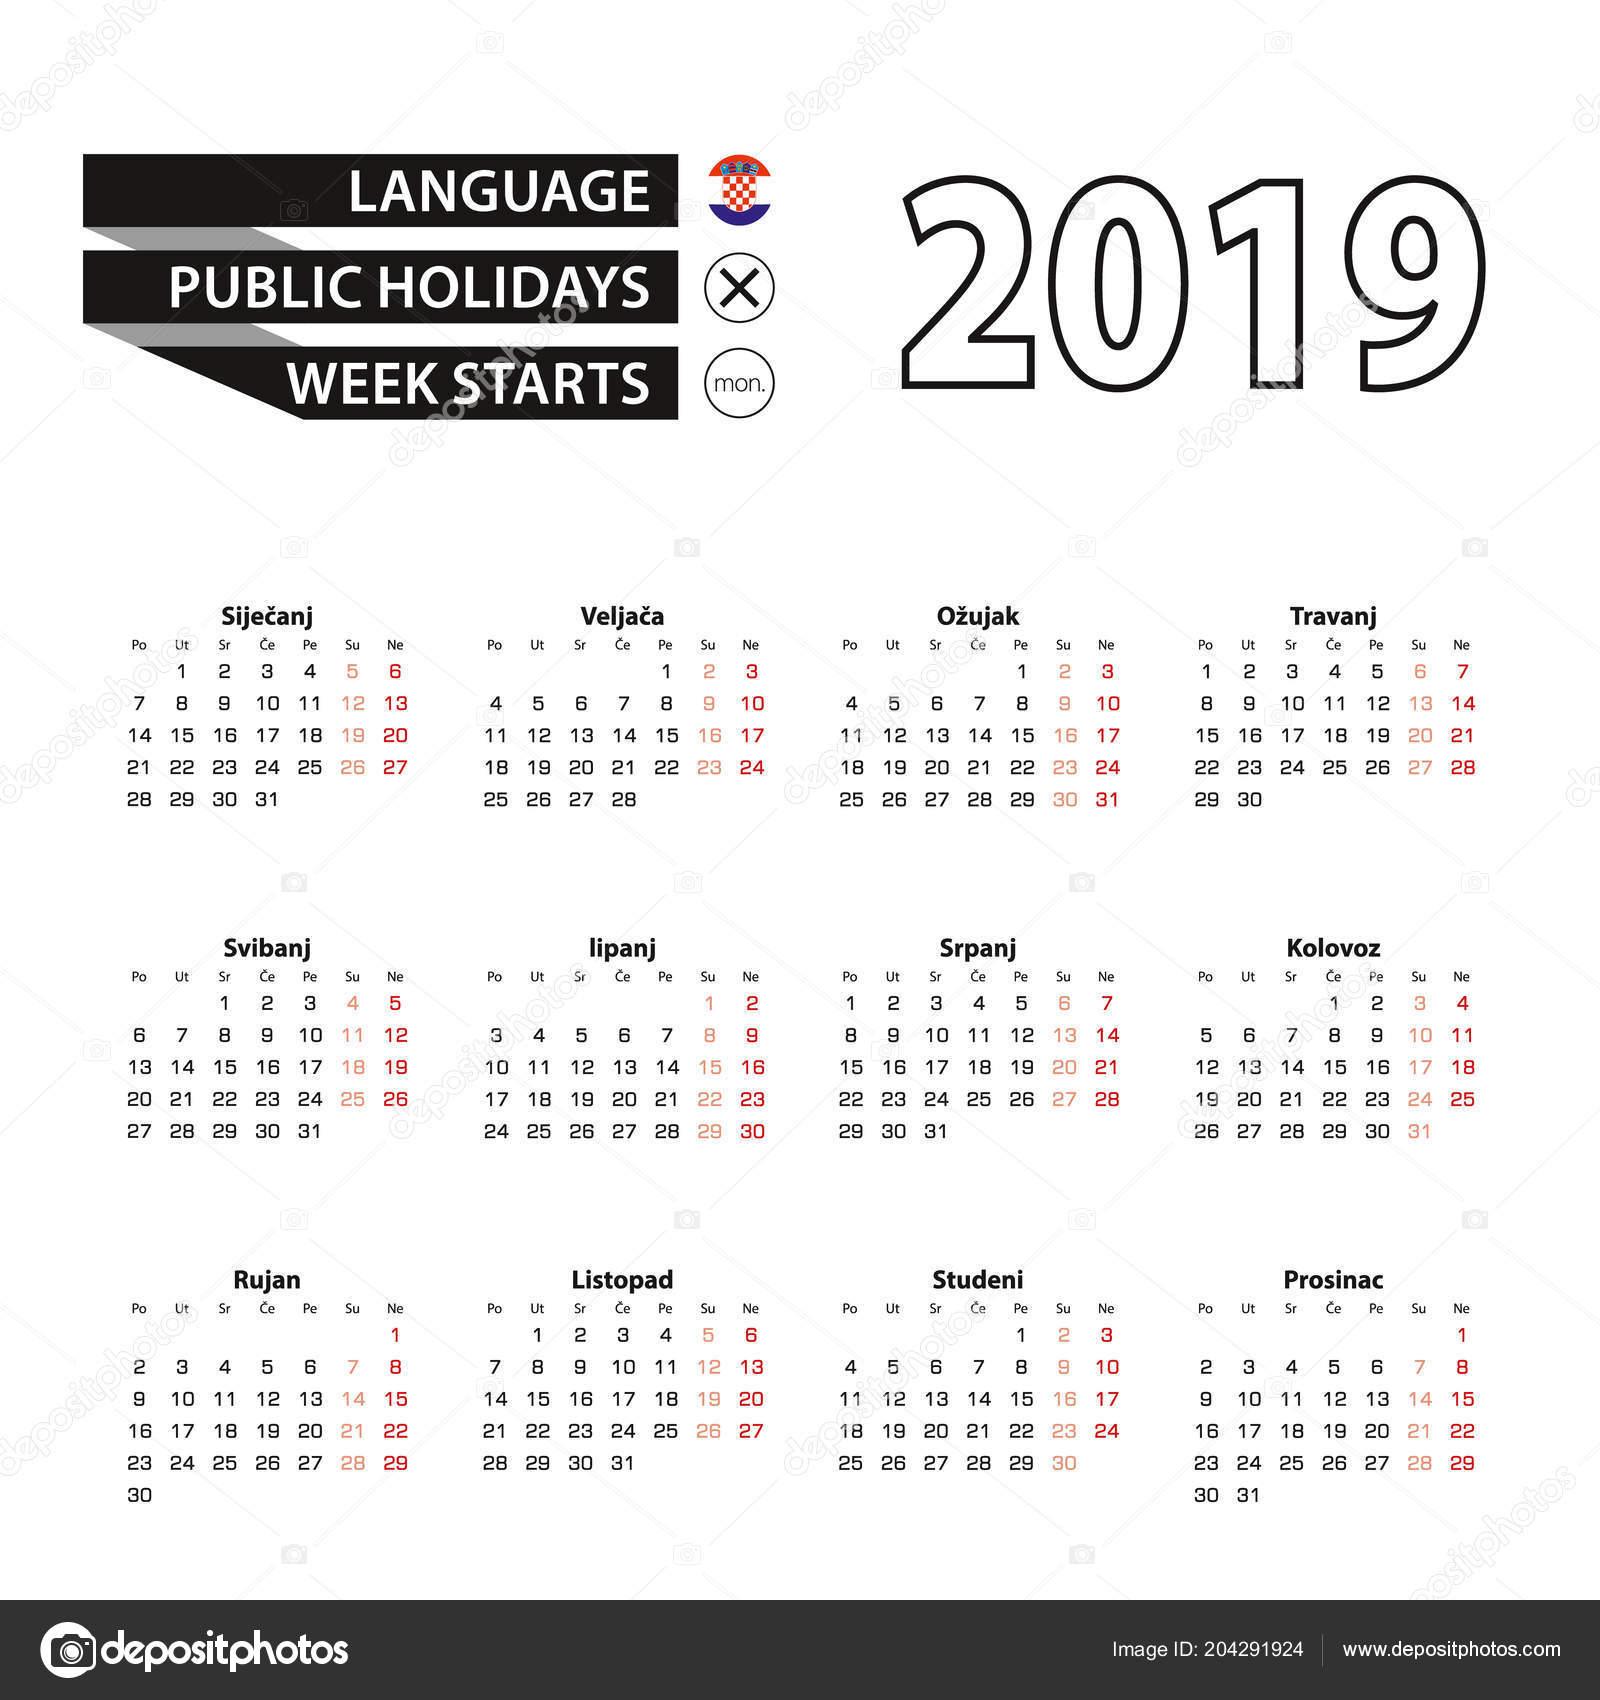 calendar 2019 in croatian language week starts on monday vector calendar 2019 year vector by boldg